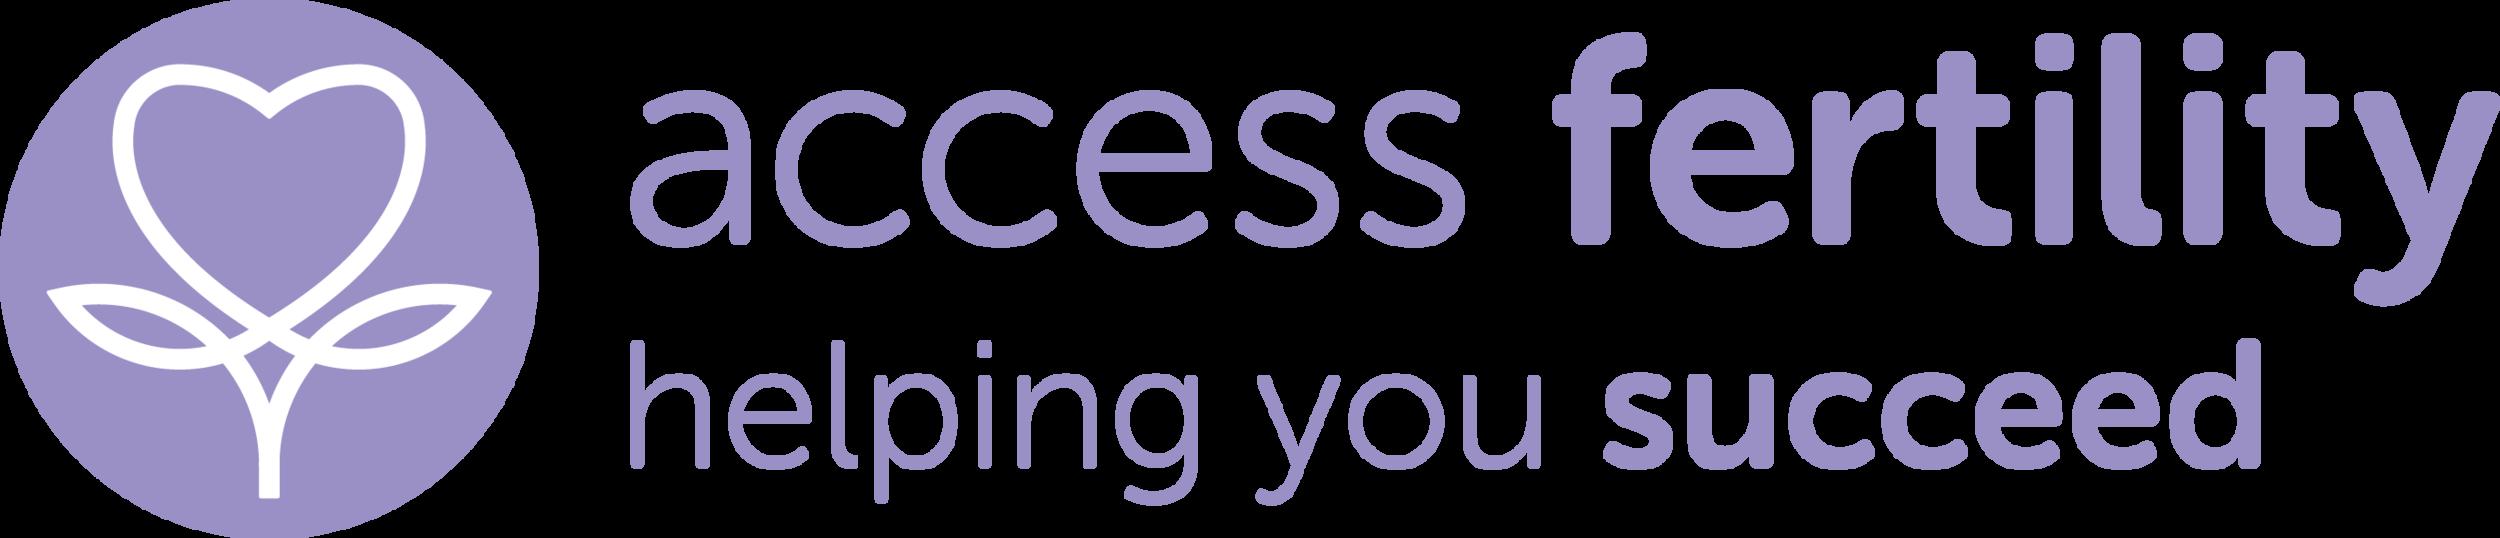 access-fertility_logo_CMYK.png